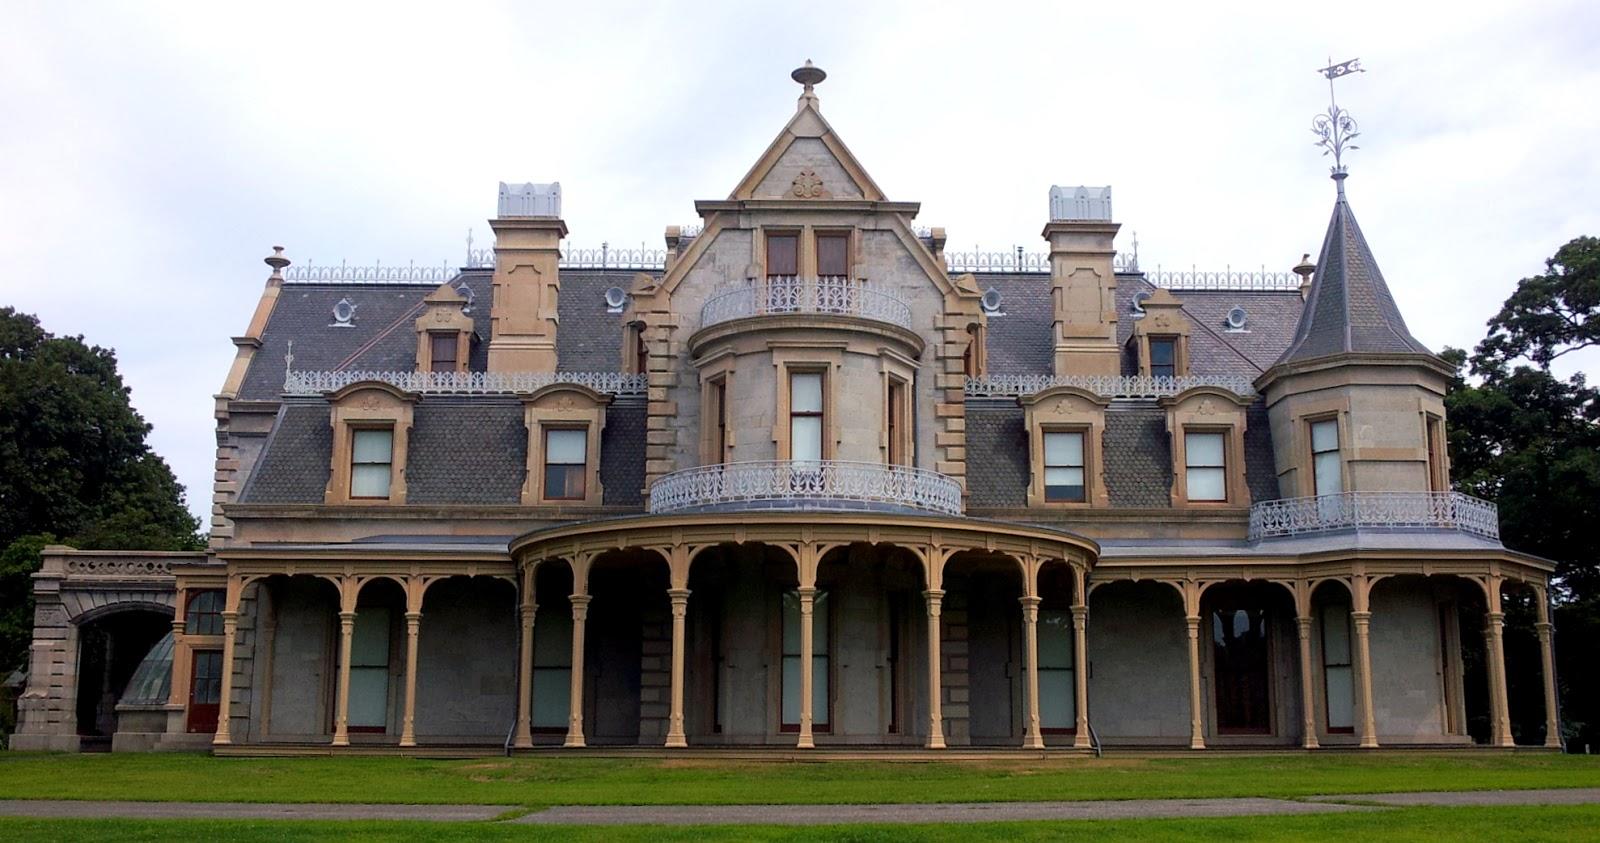 Bucklebury Middleton House An Architectural Pilgrimage Lockwood Mathews Mansion